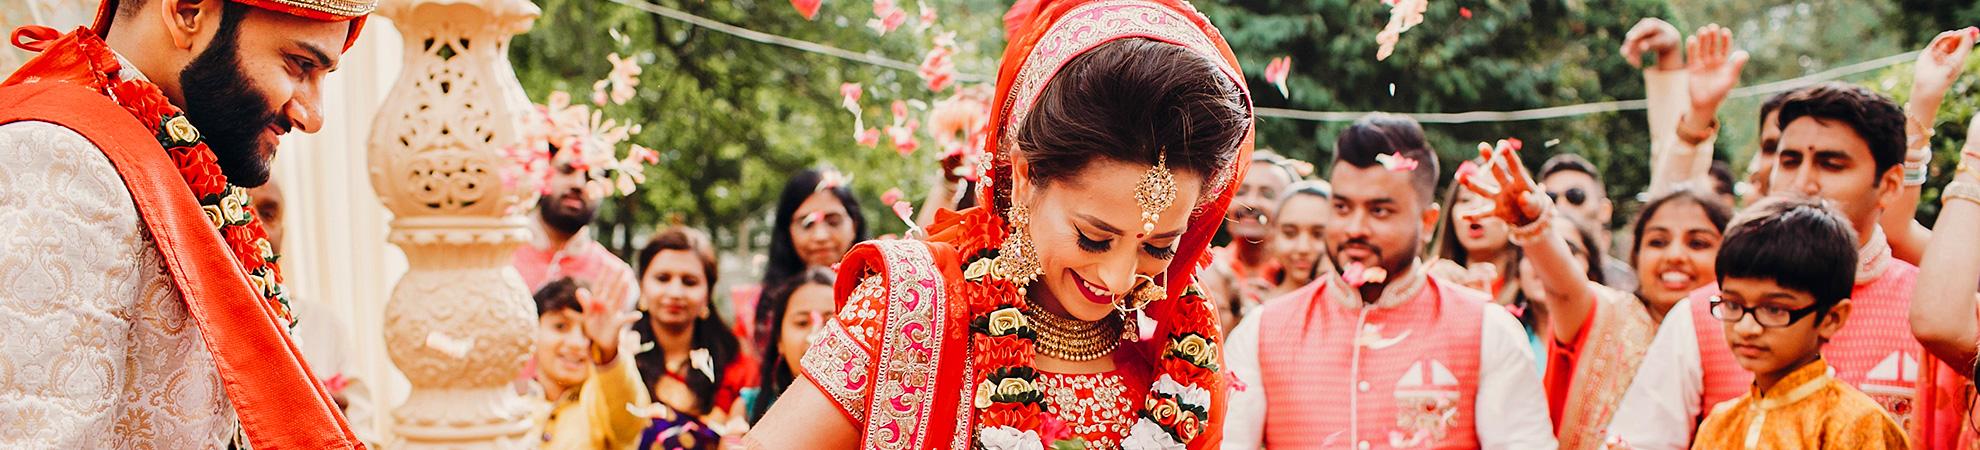 Culture en Inde